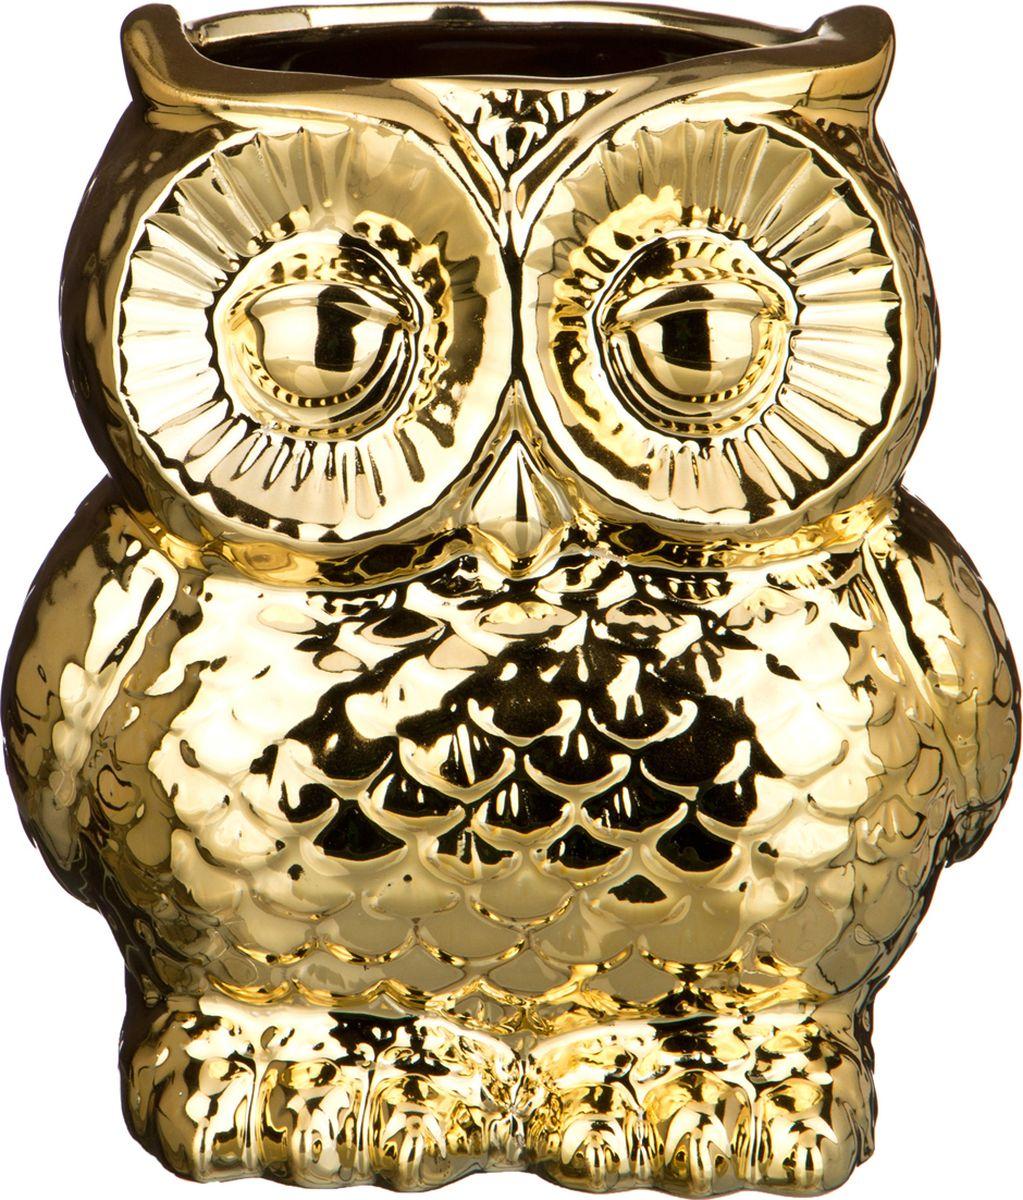 "Ваза Lefard ""Сова"", цвет: золотистый, 16 х 13,5 х 18 см"